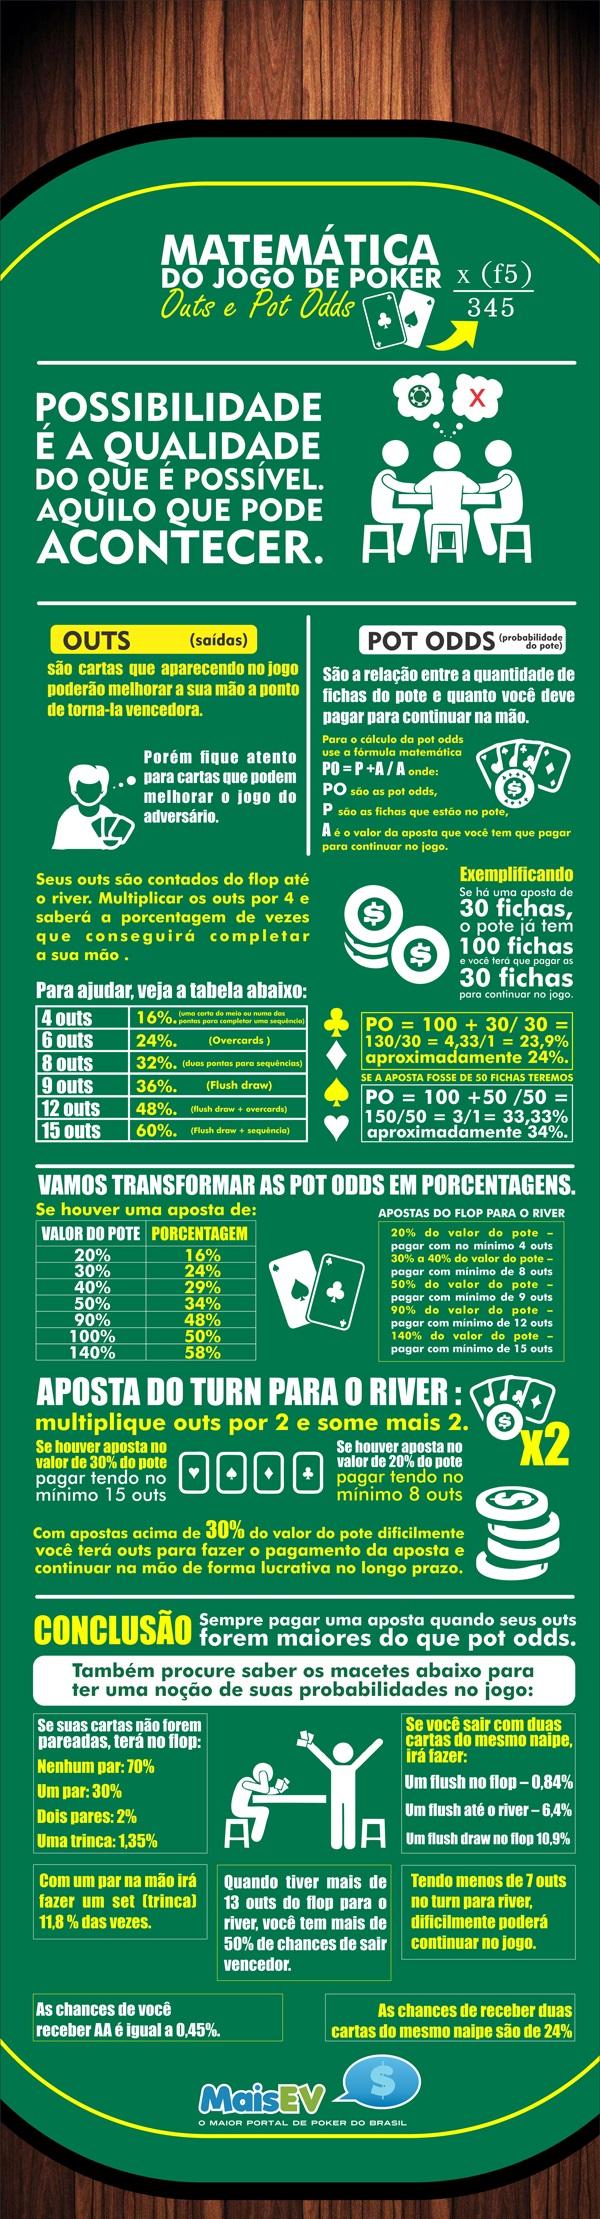 Infográfico matemática do poker